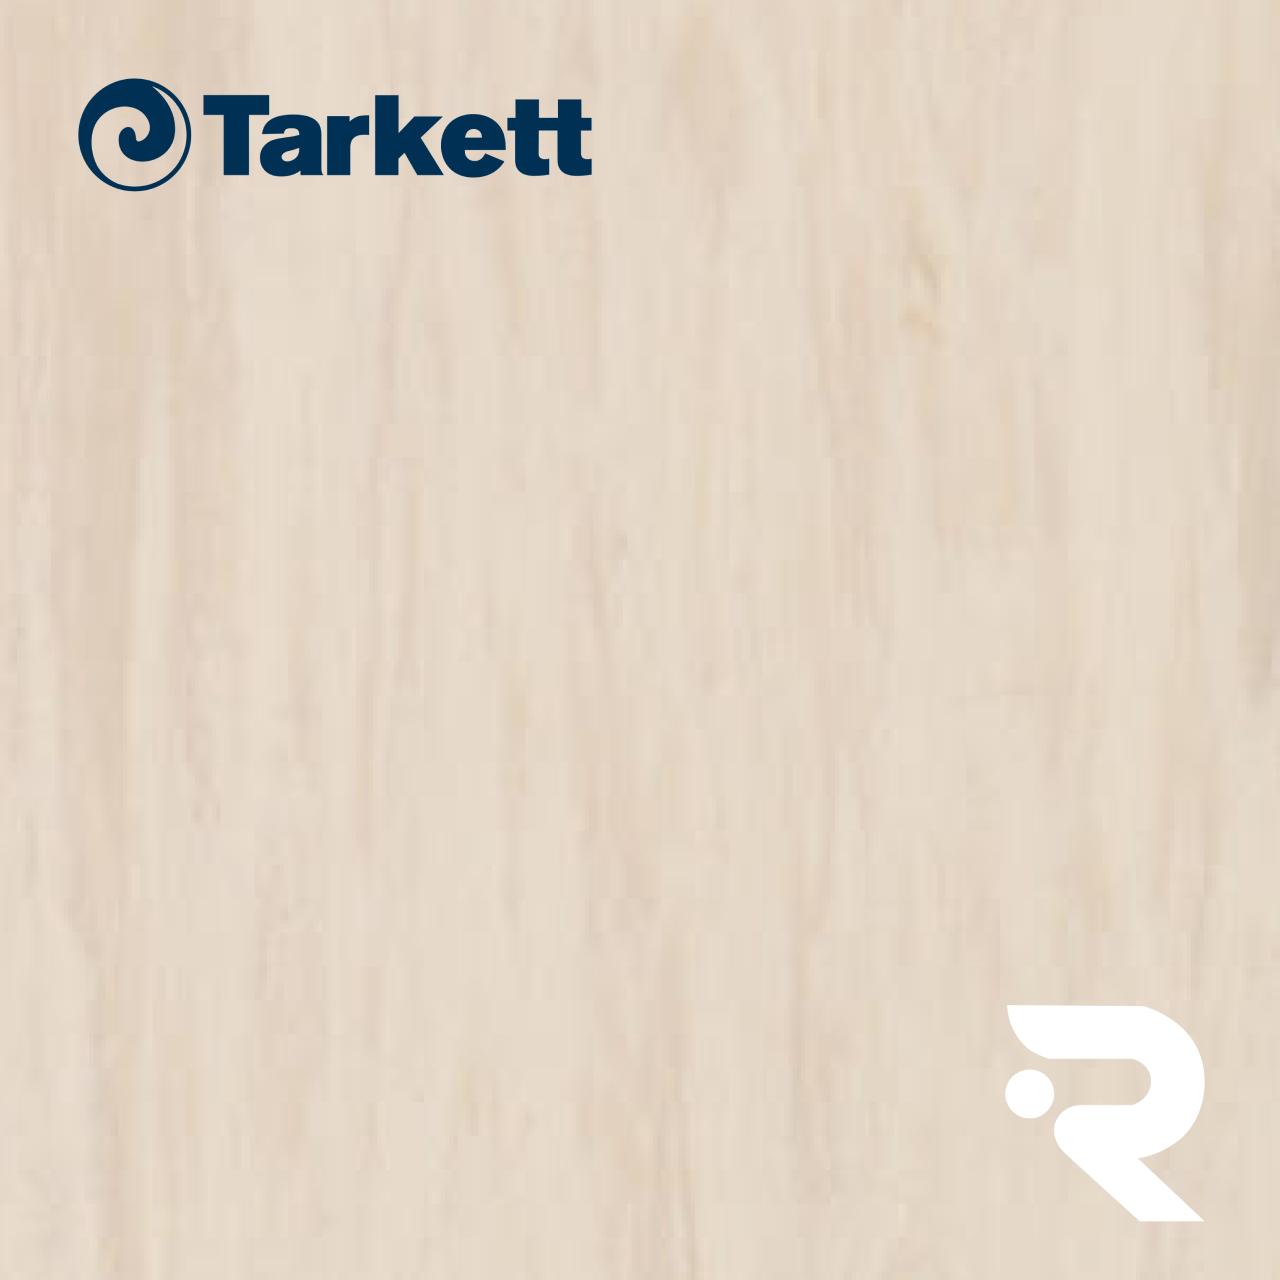 🏫 Гомогенный линолеум Tarkett   Standard SAND LIGHT 0912   Standard Plus 2.0 mm   2 х 23 м